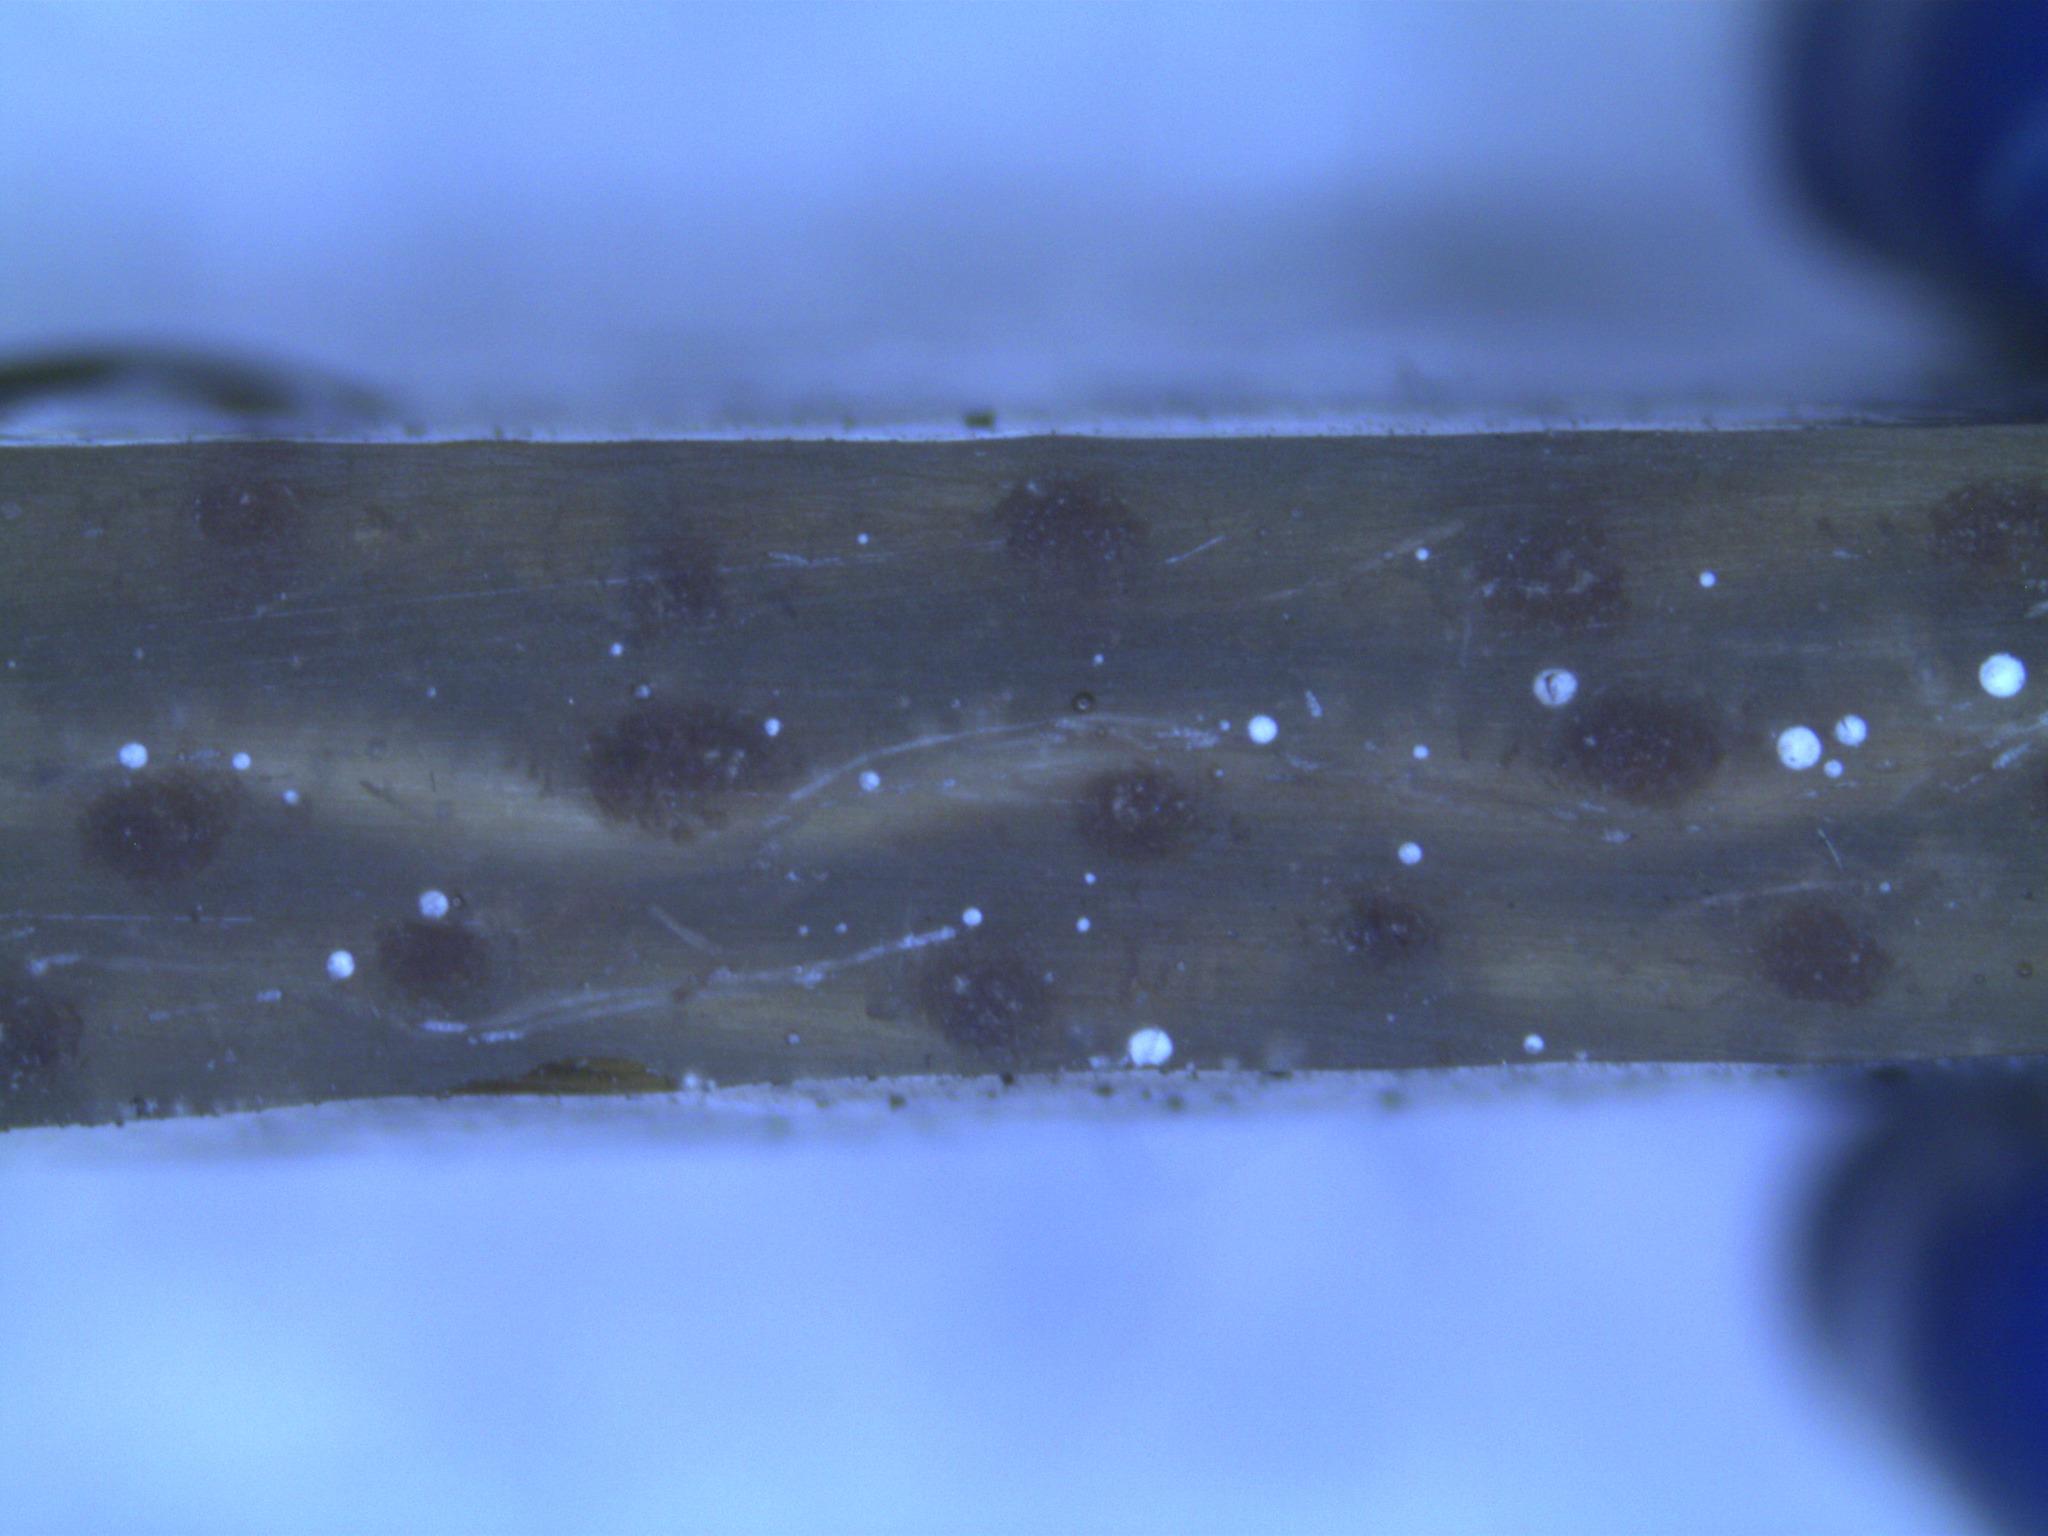 composites-microscopy/vacuum-side.jpg